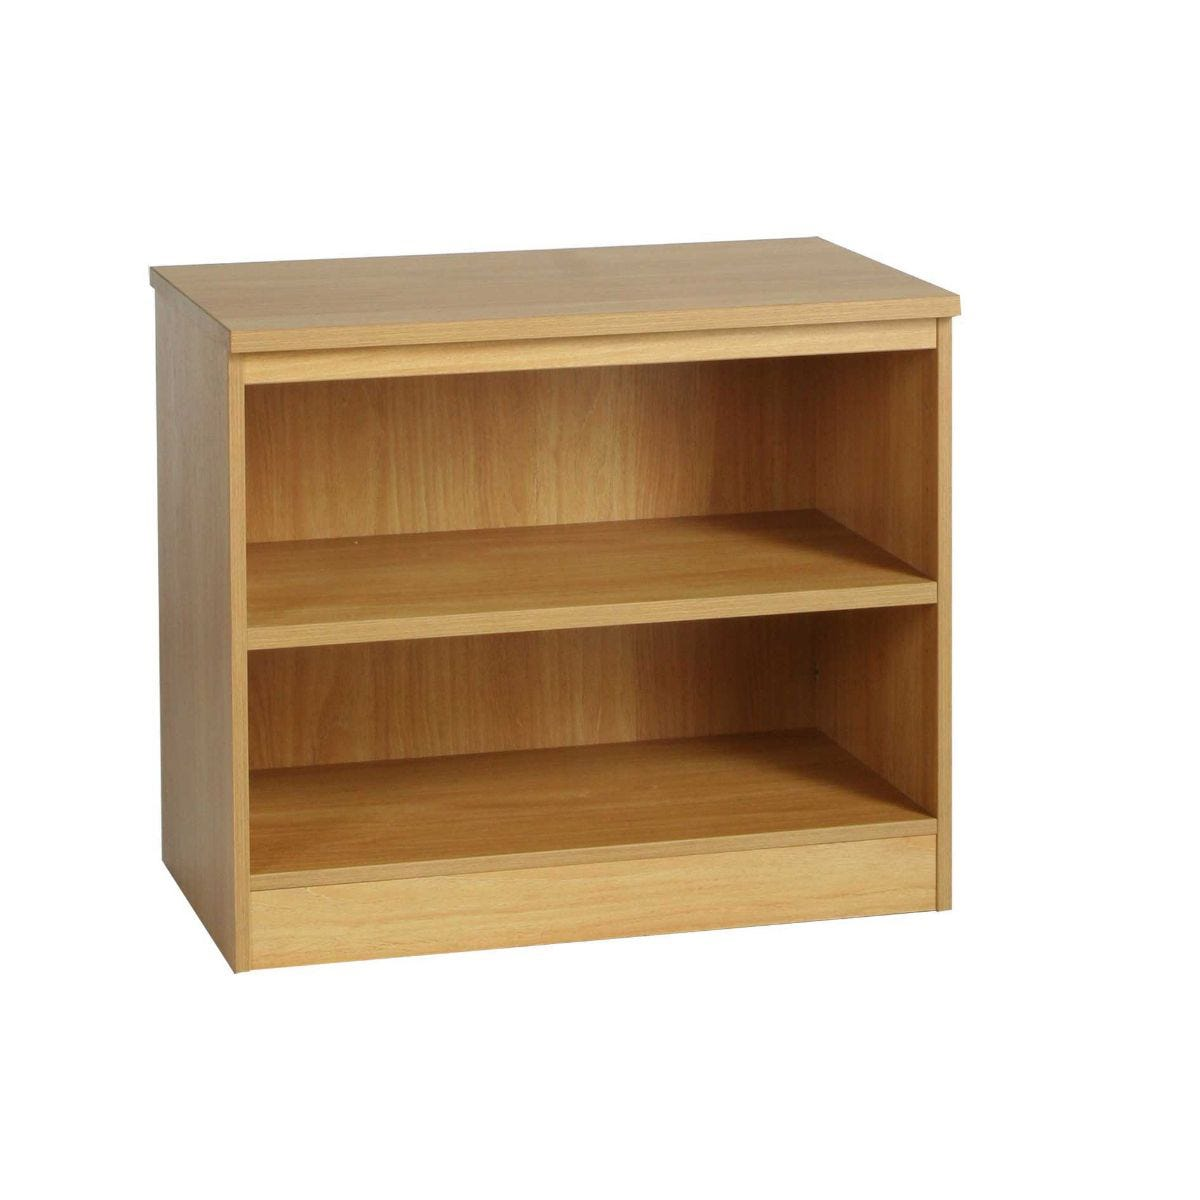 R White Bookcase B-B85 H728xW850xD540mm, Classic Oak